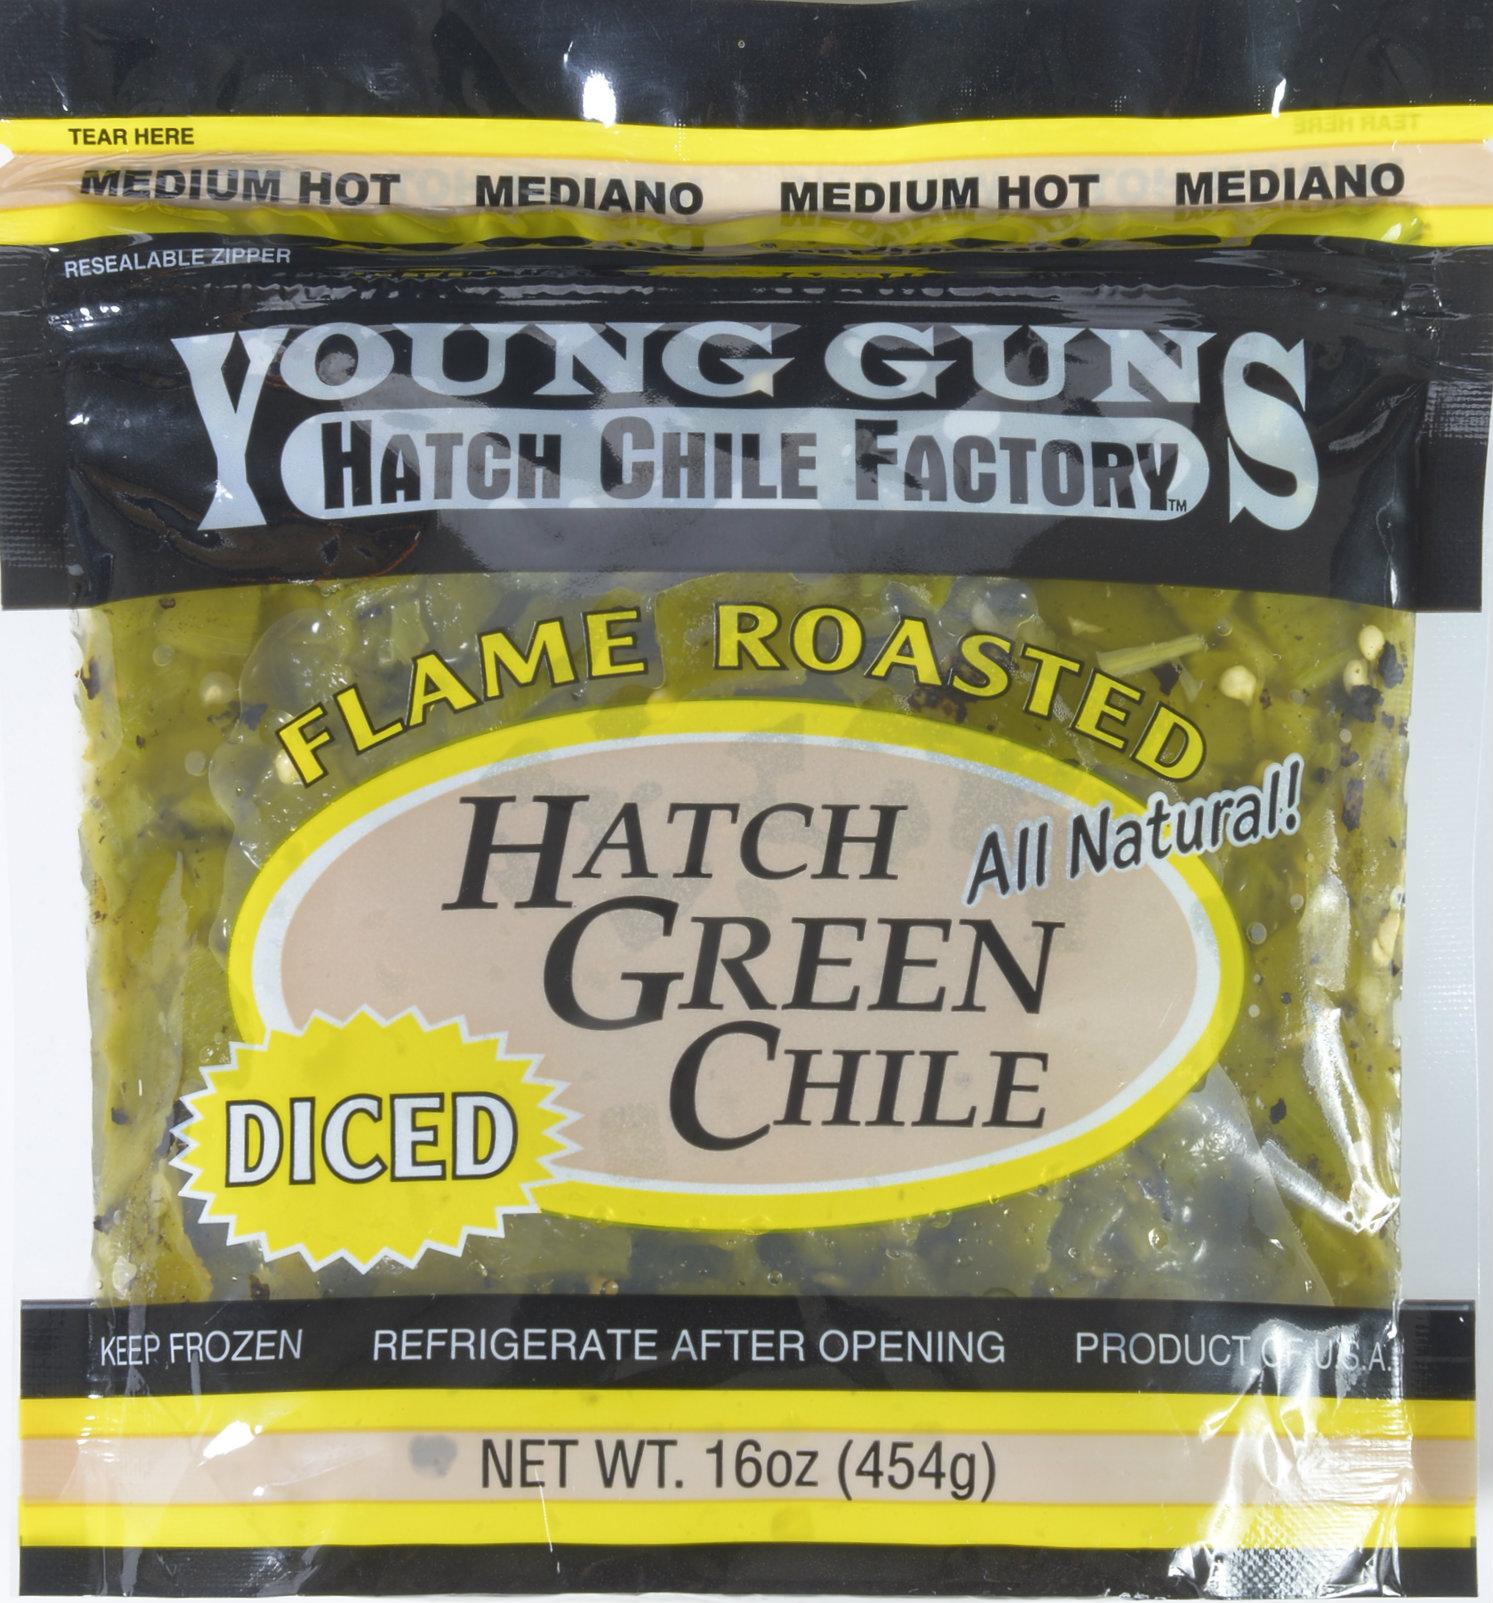 Hatch Green Chile Frozen - Medium Hot